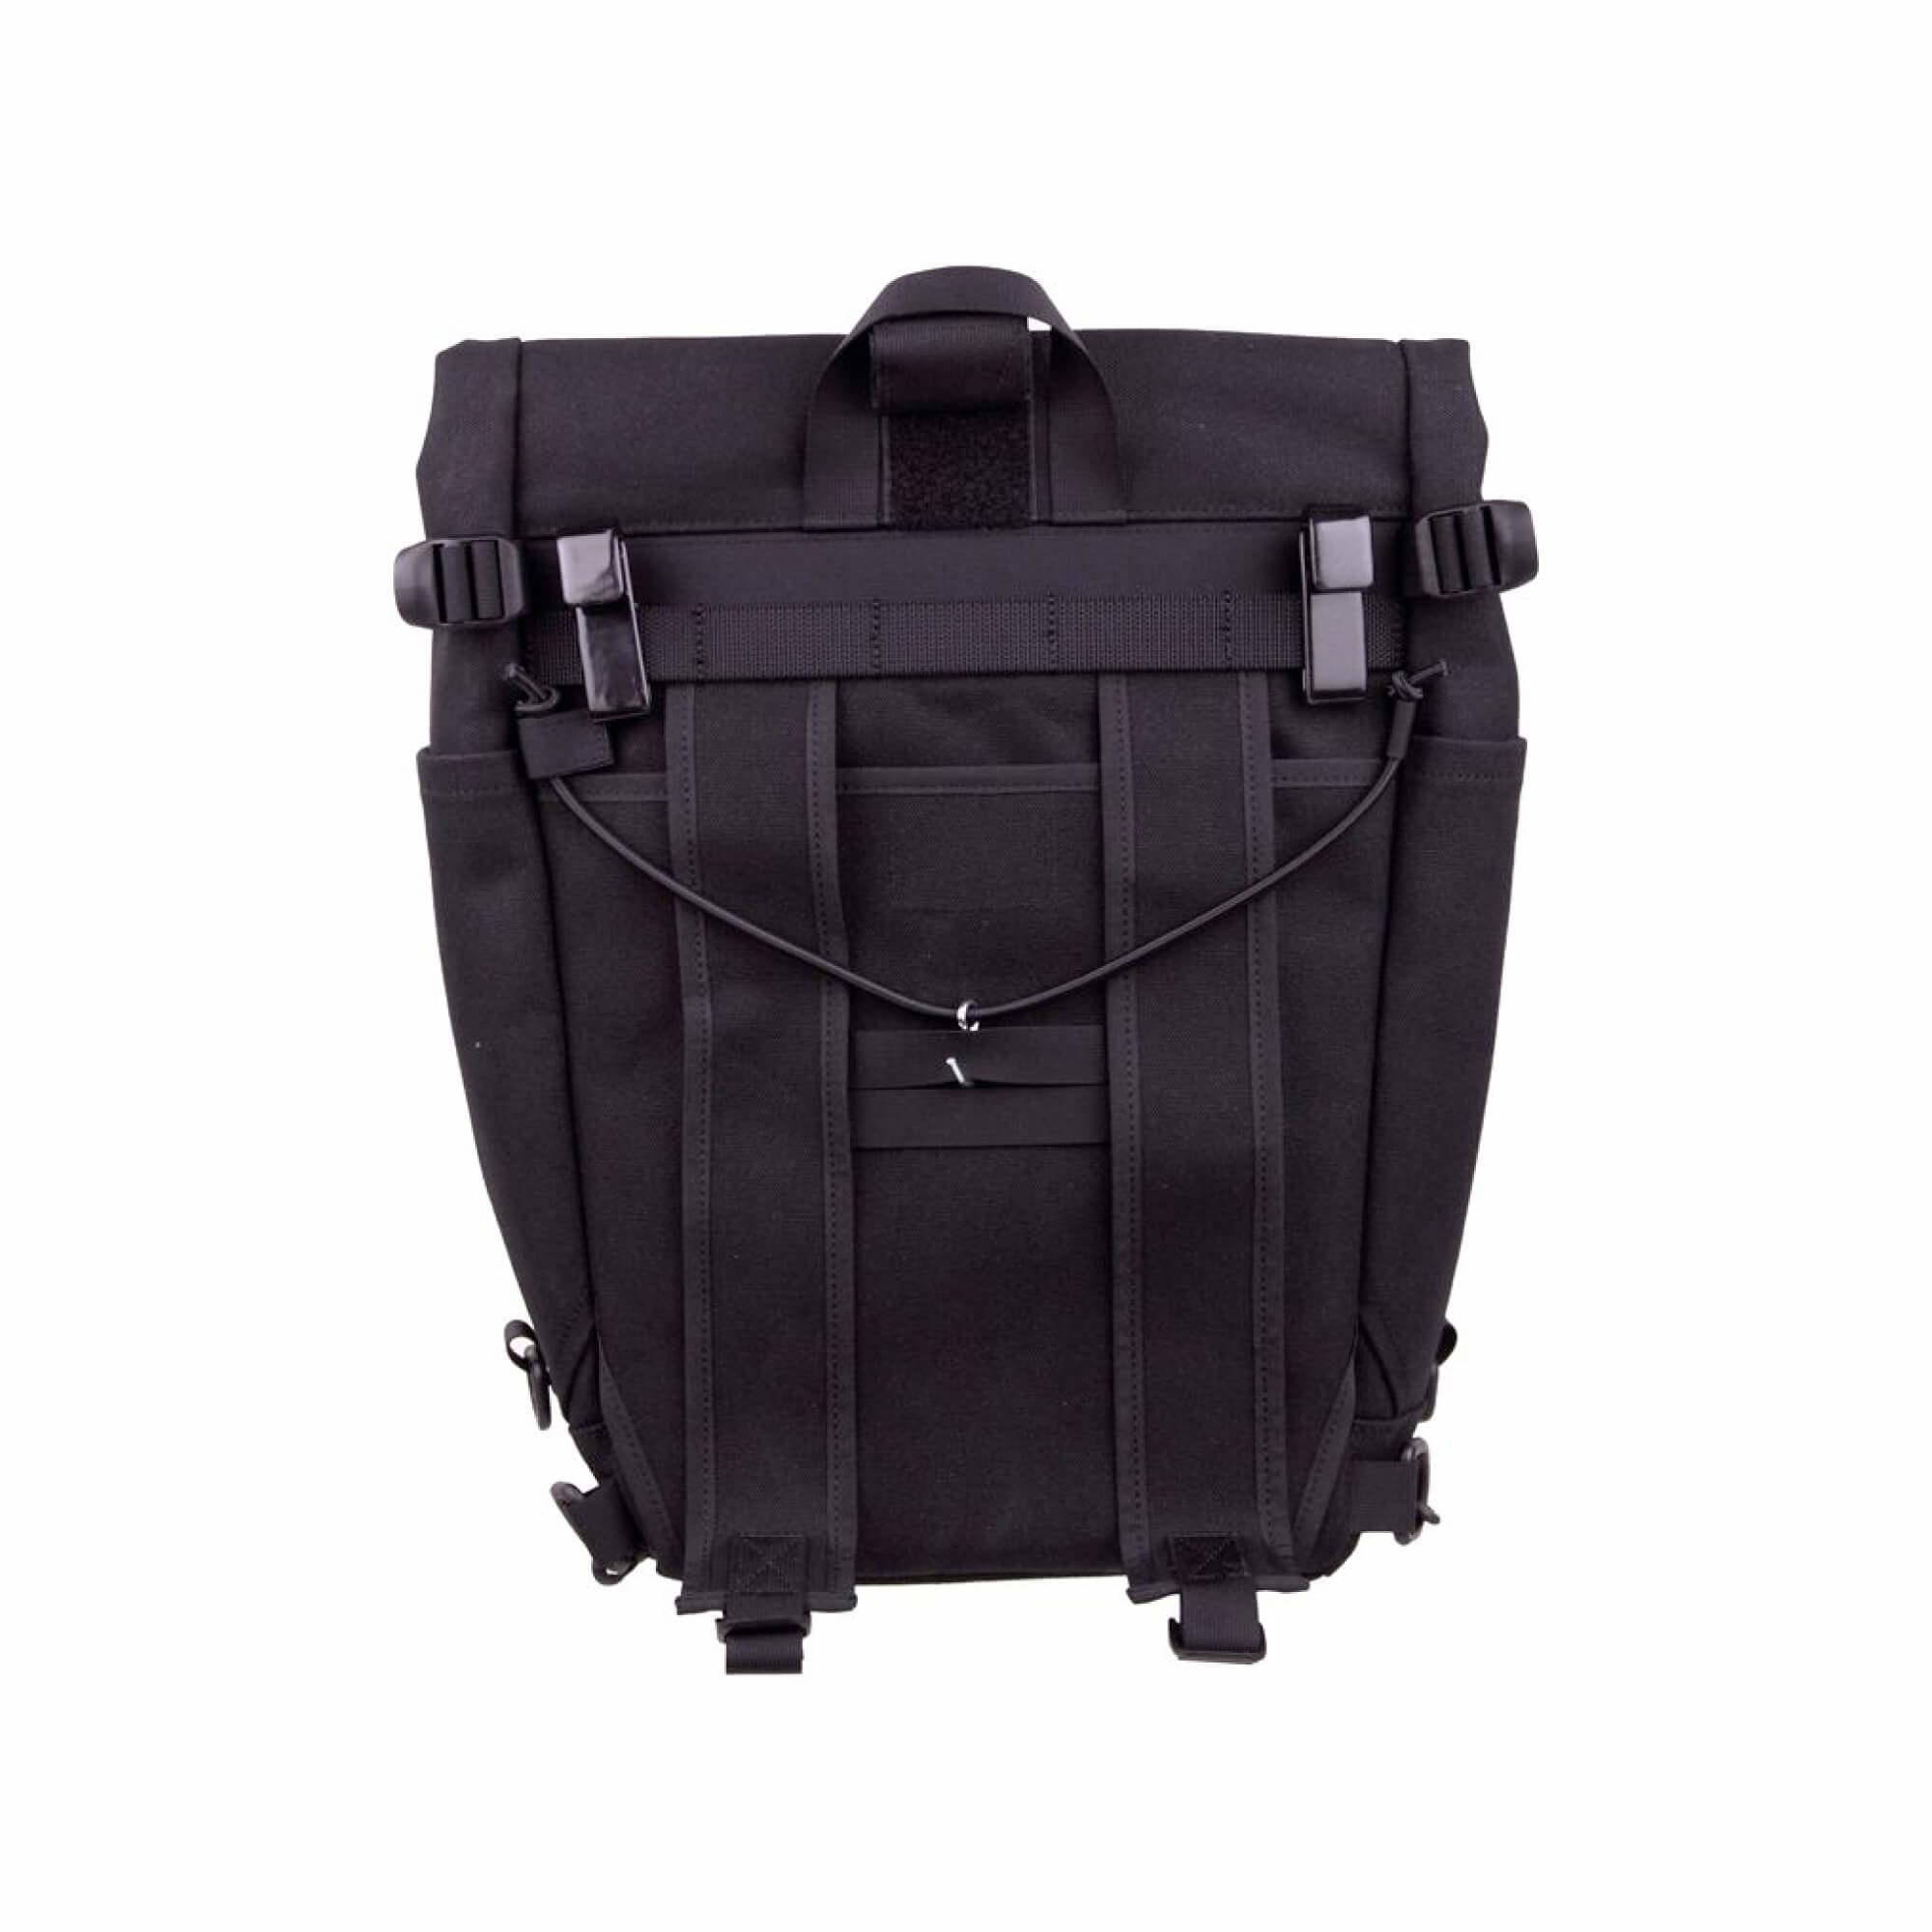 Roll Top Pannier Bag Black-4